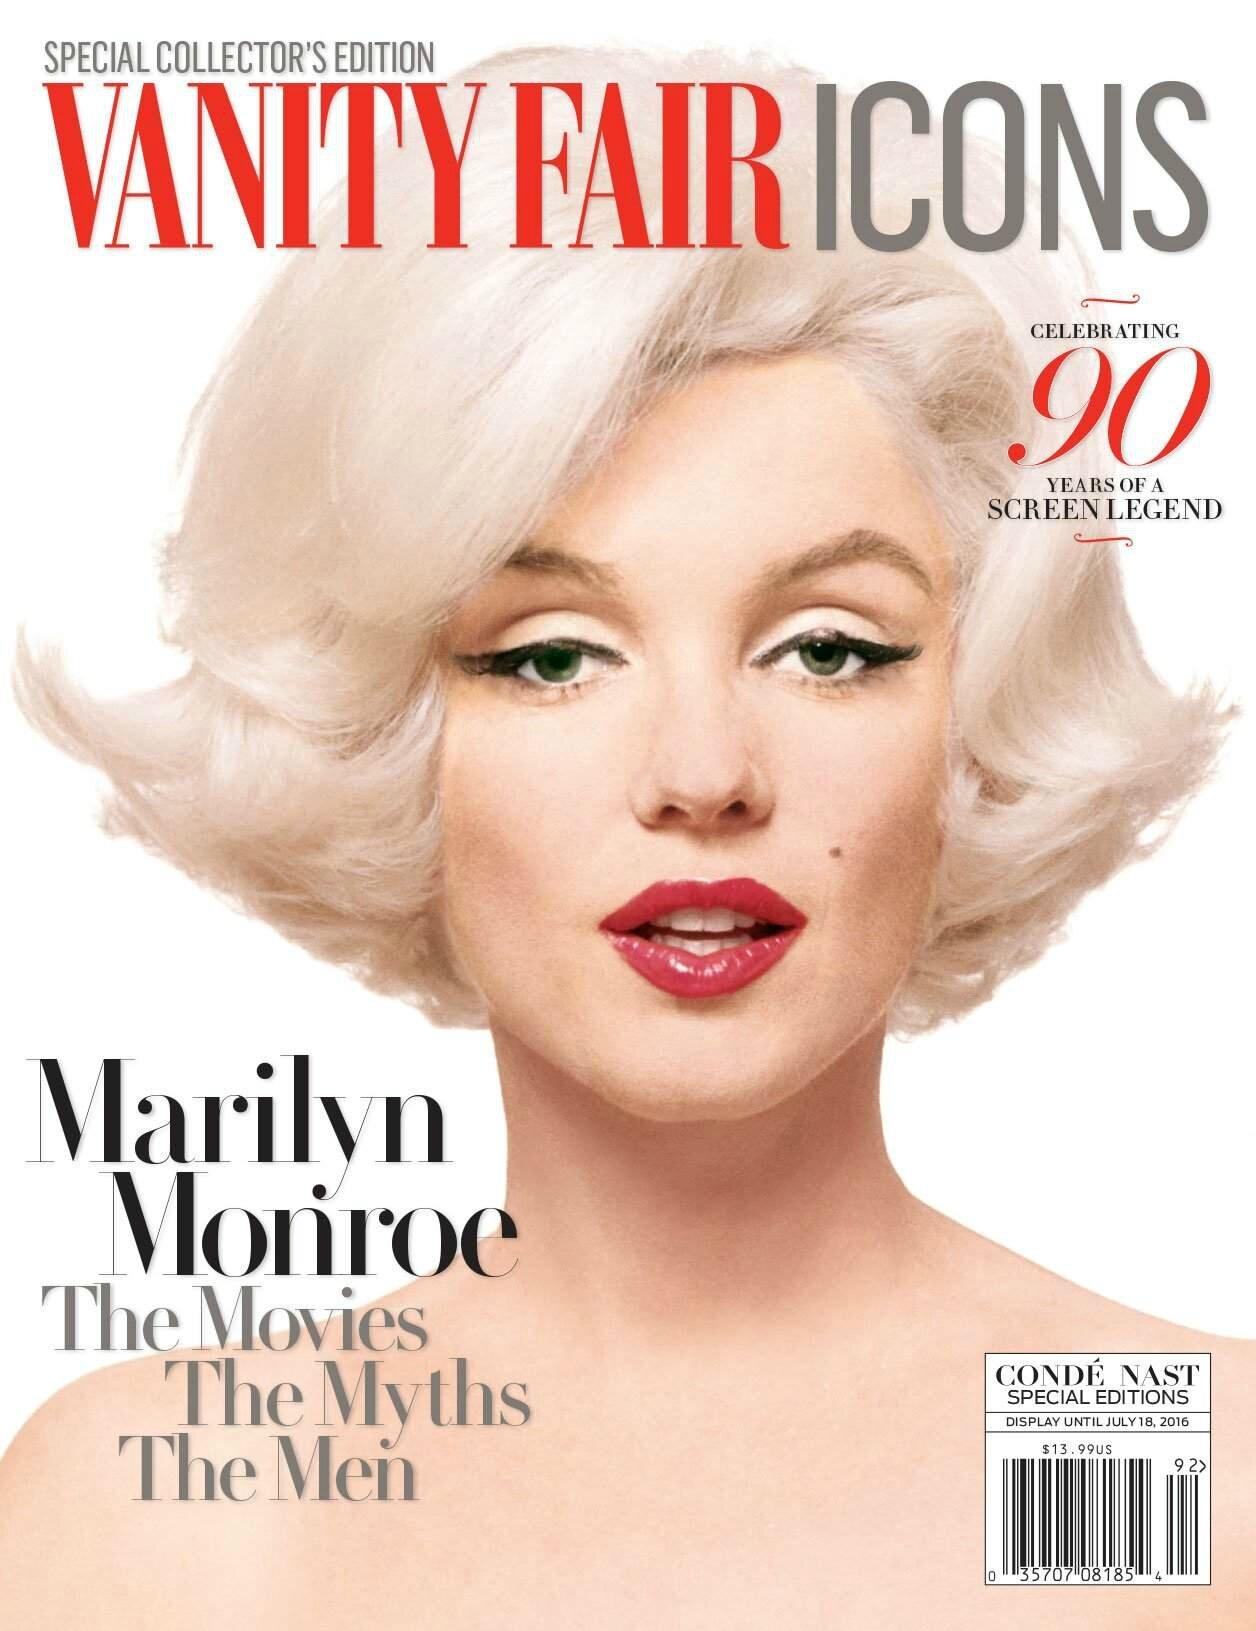 2016-04-21-Vanity_Fair_Icons-HS-USA